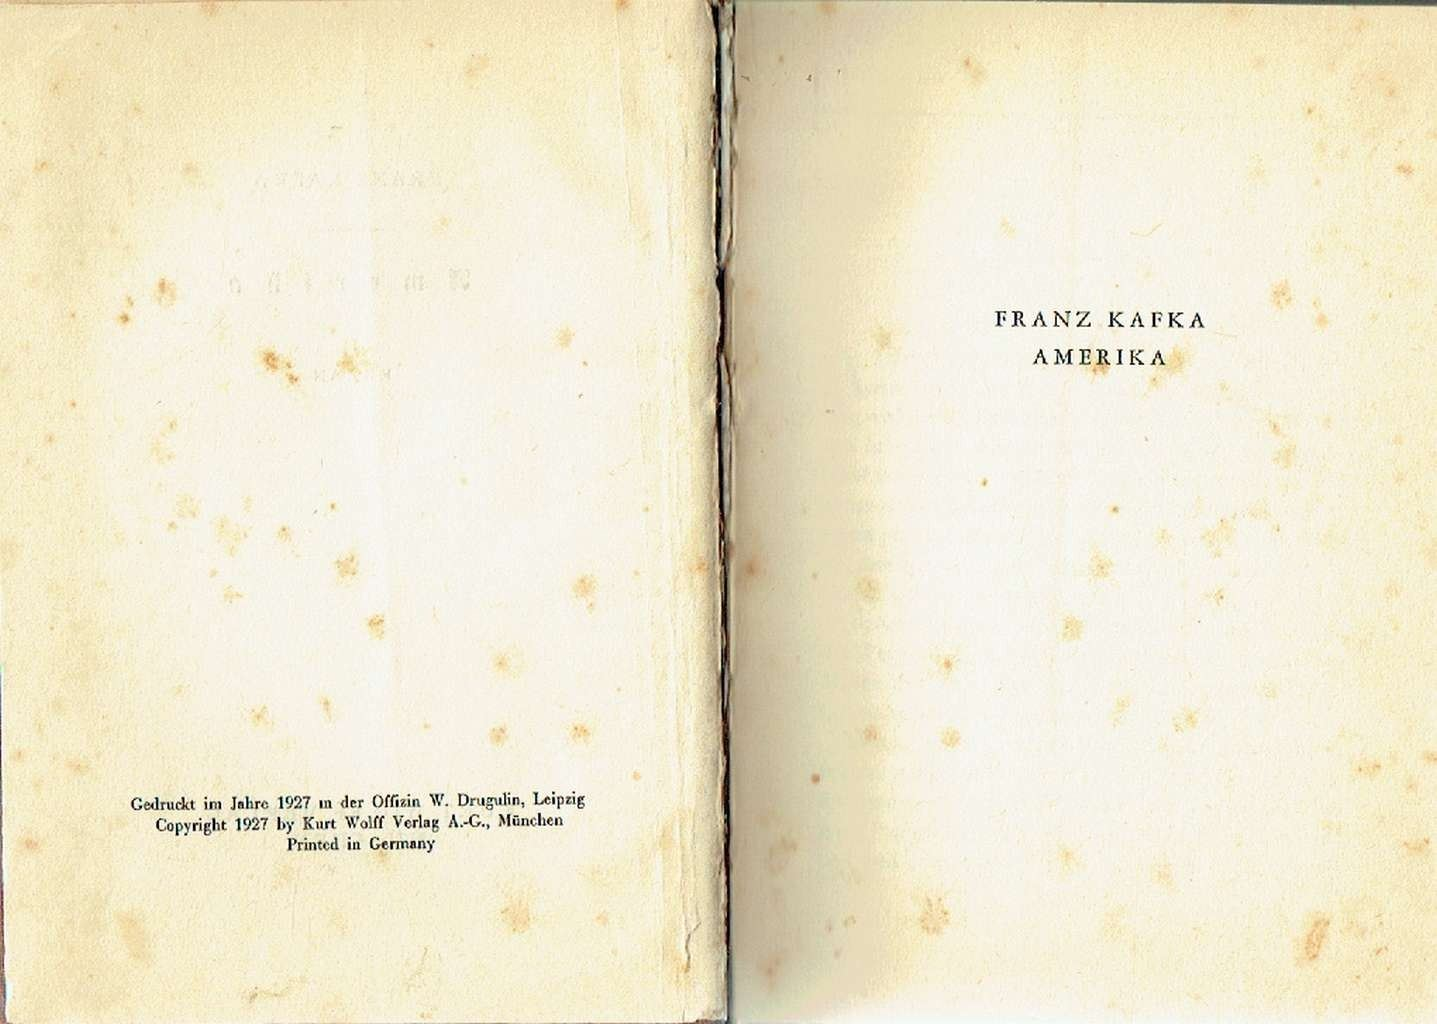 Franz kafka amerika online dating